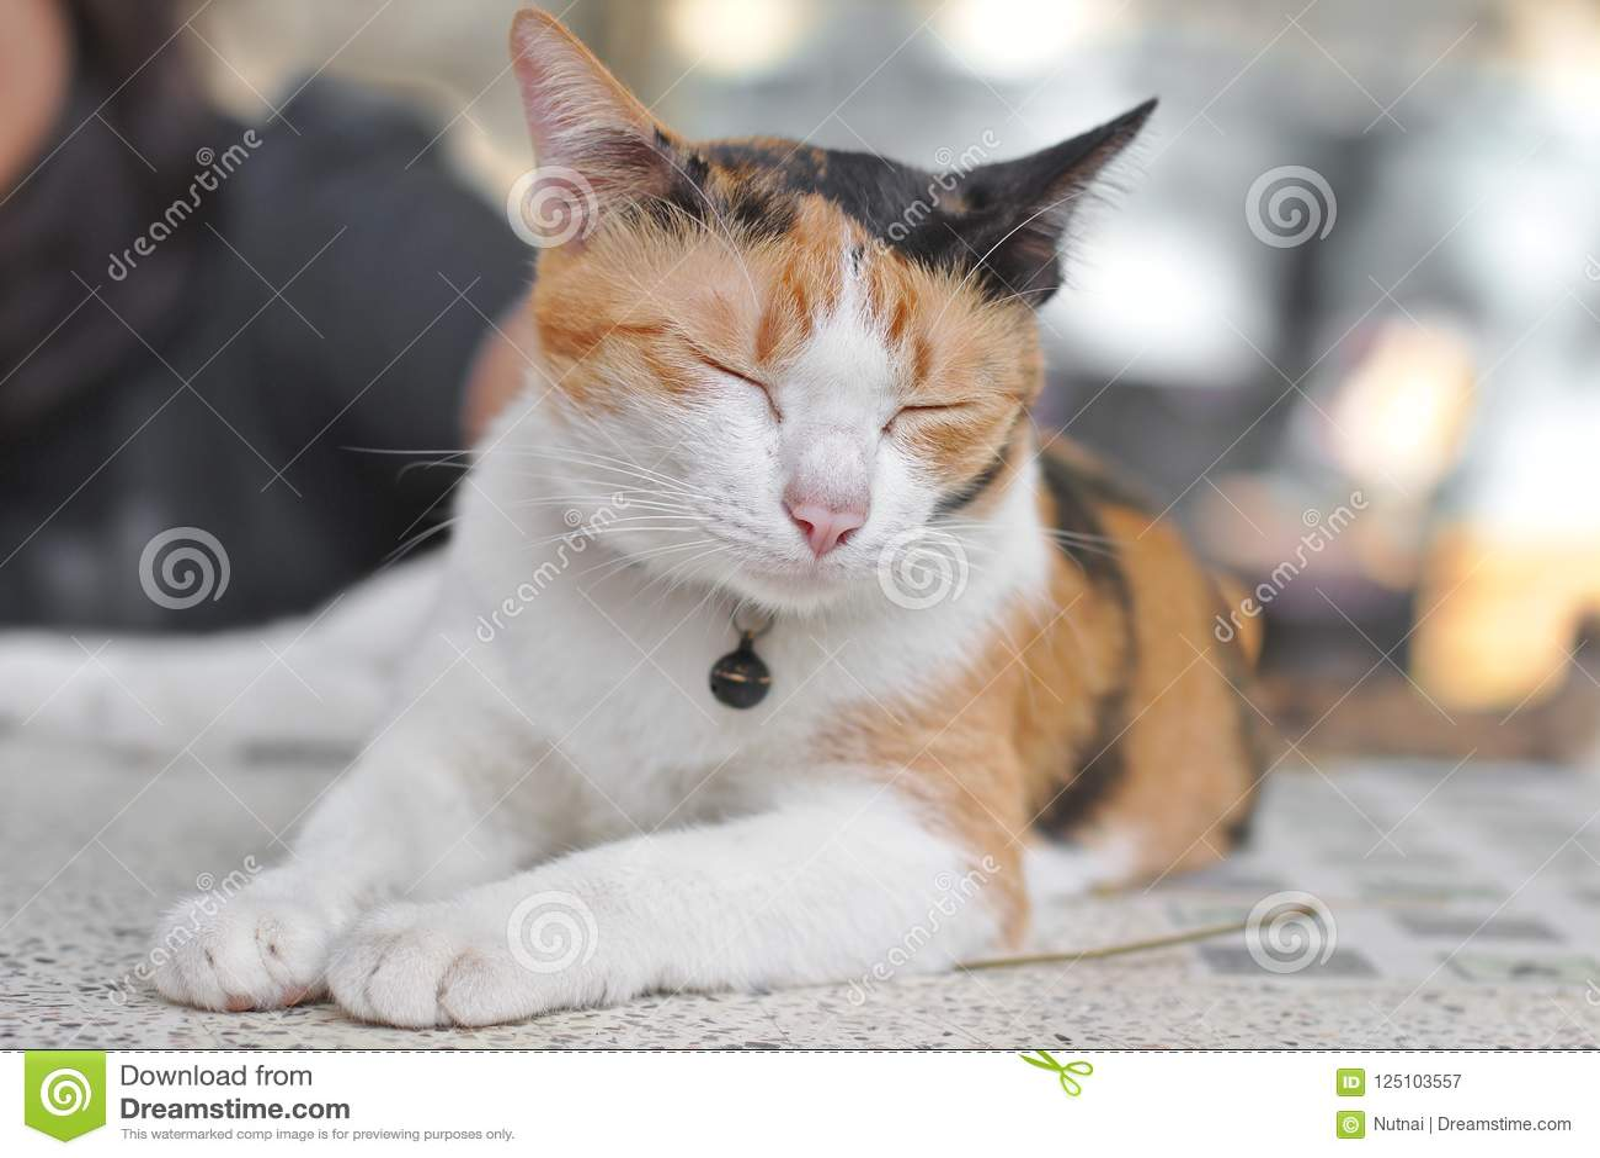 da77a53c8f2 Calico Cat, Cute Tortoiseshell Cat Sleeping Stock Image - Image of ...